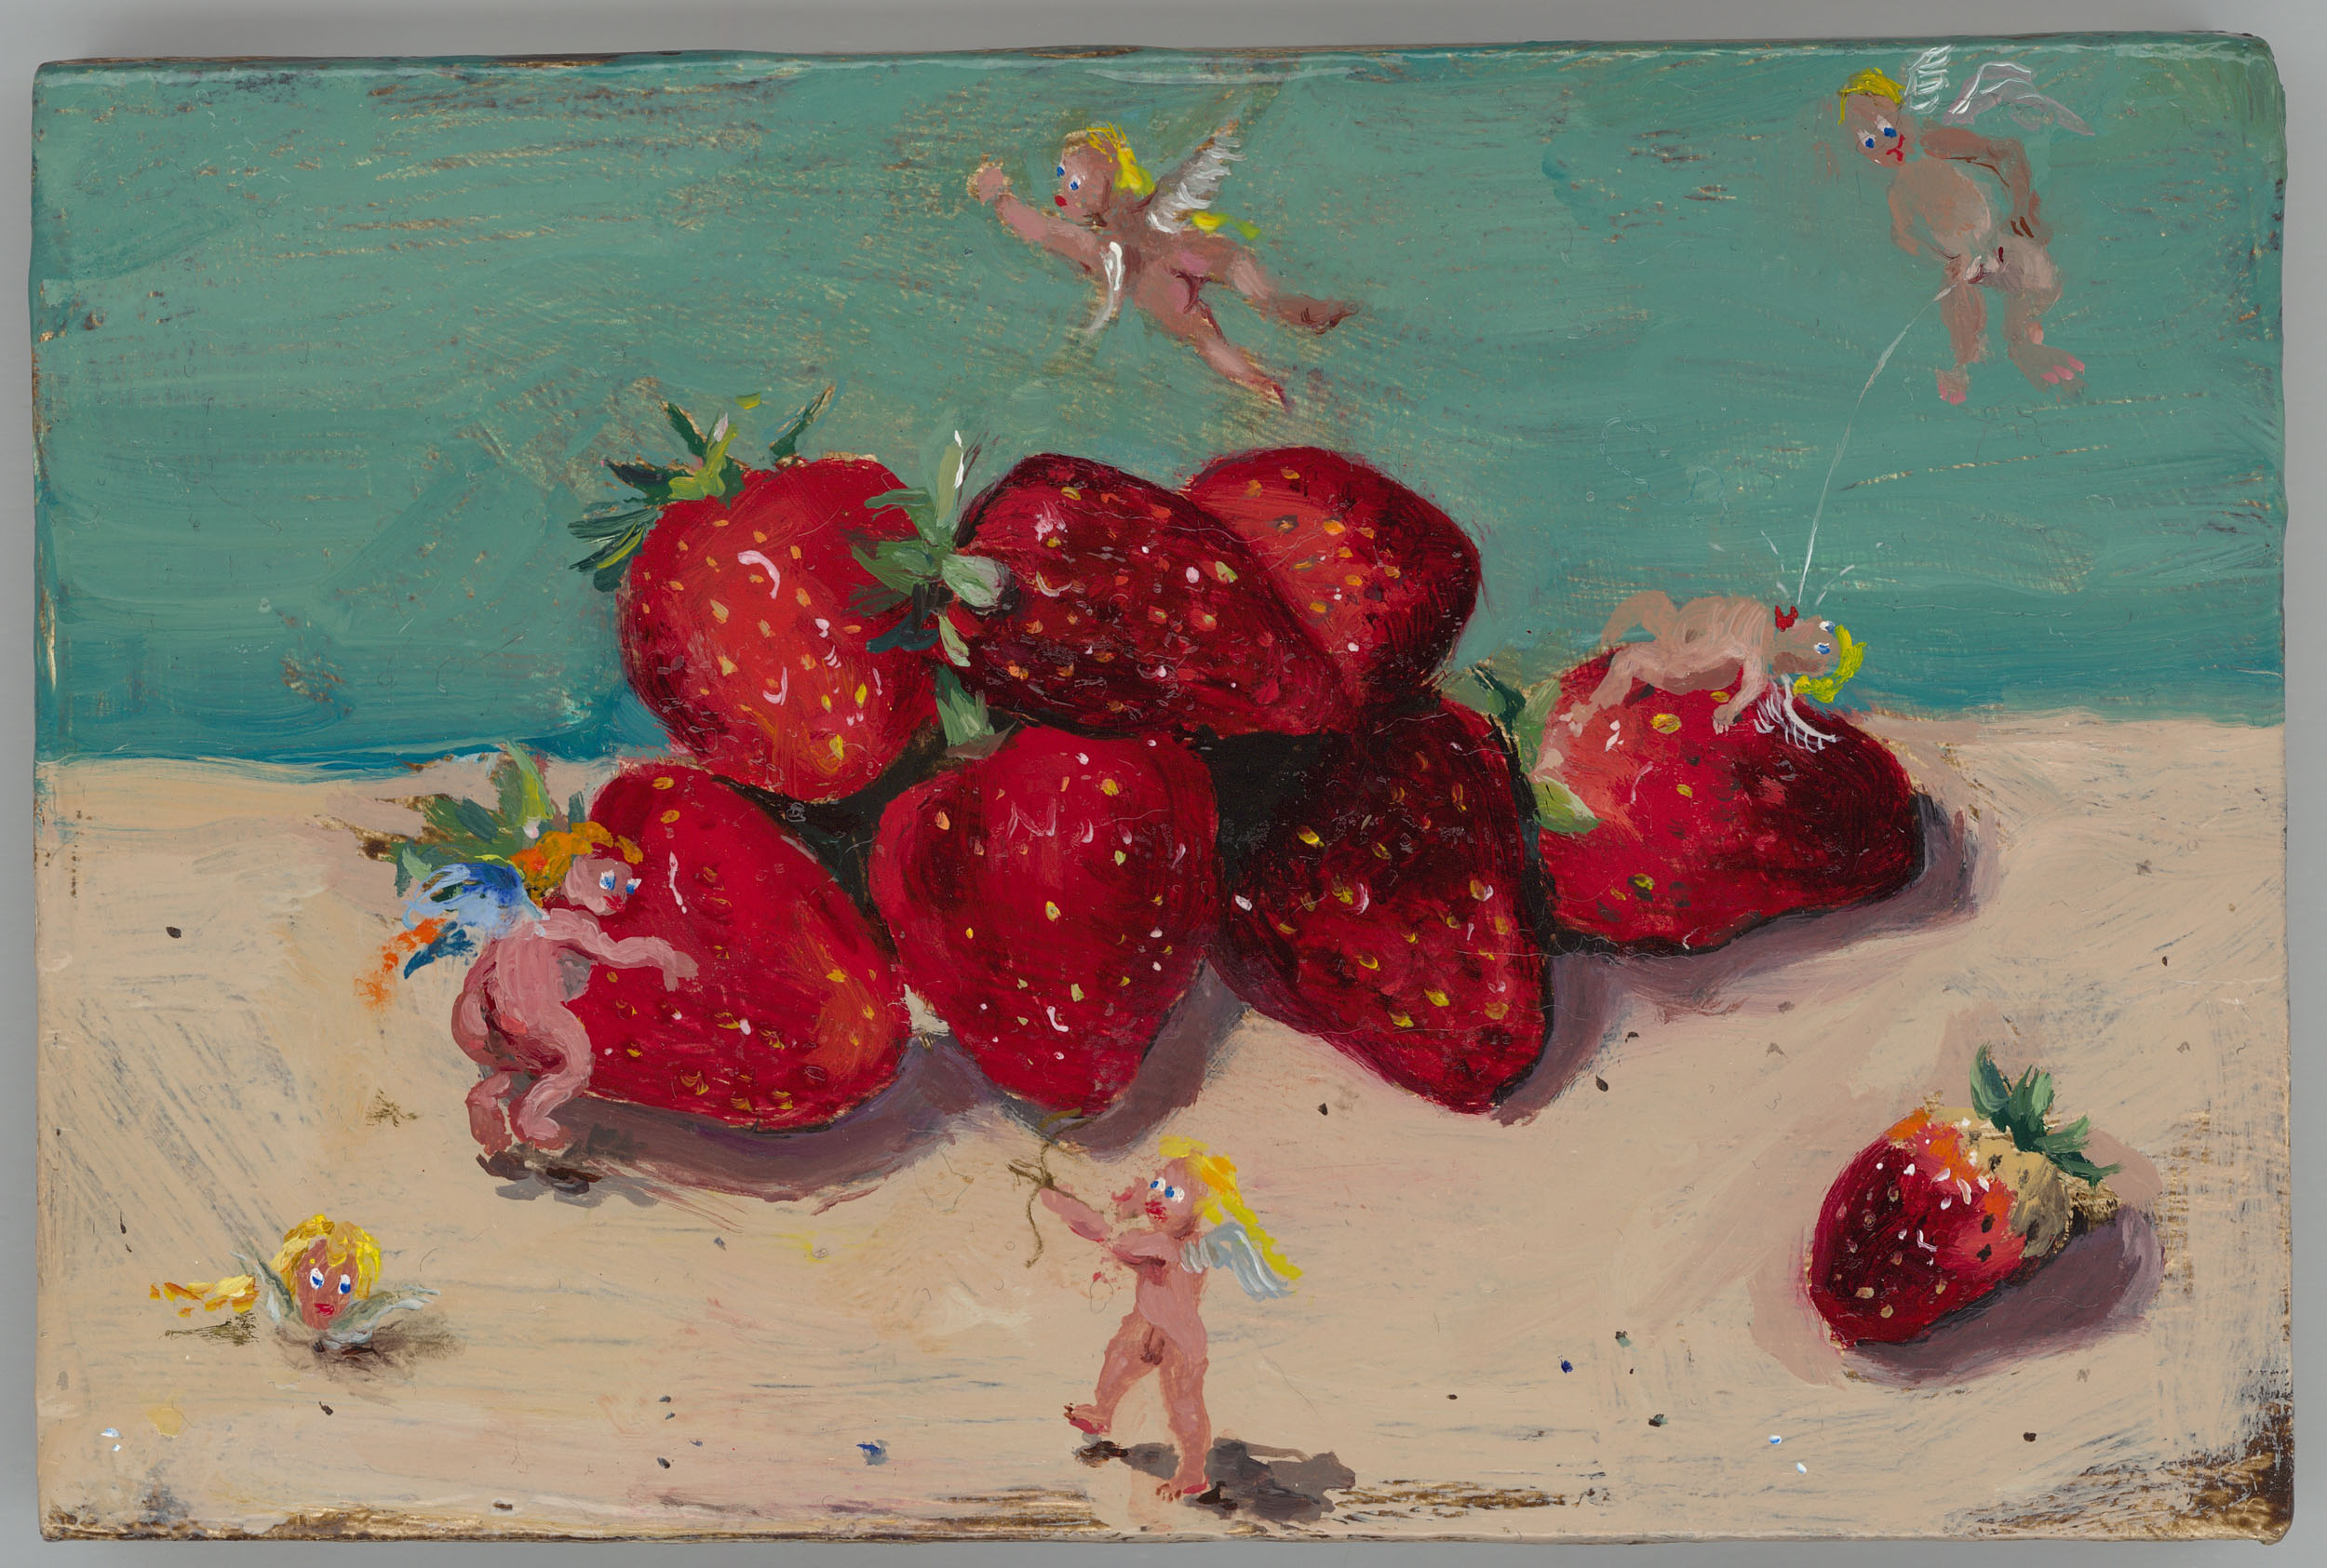 sartore adria - engel mit erdbeeren / angels with strawberries